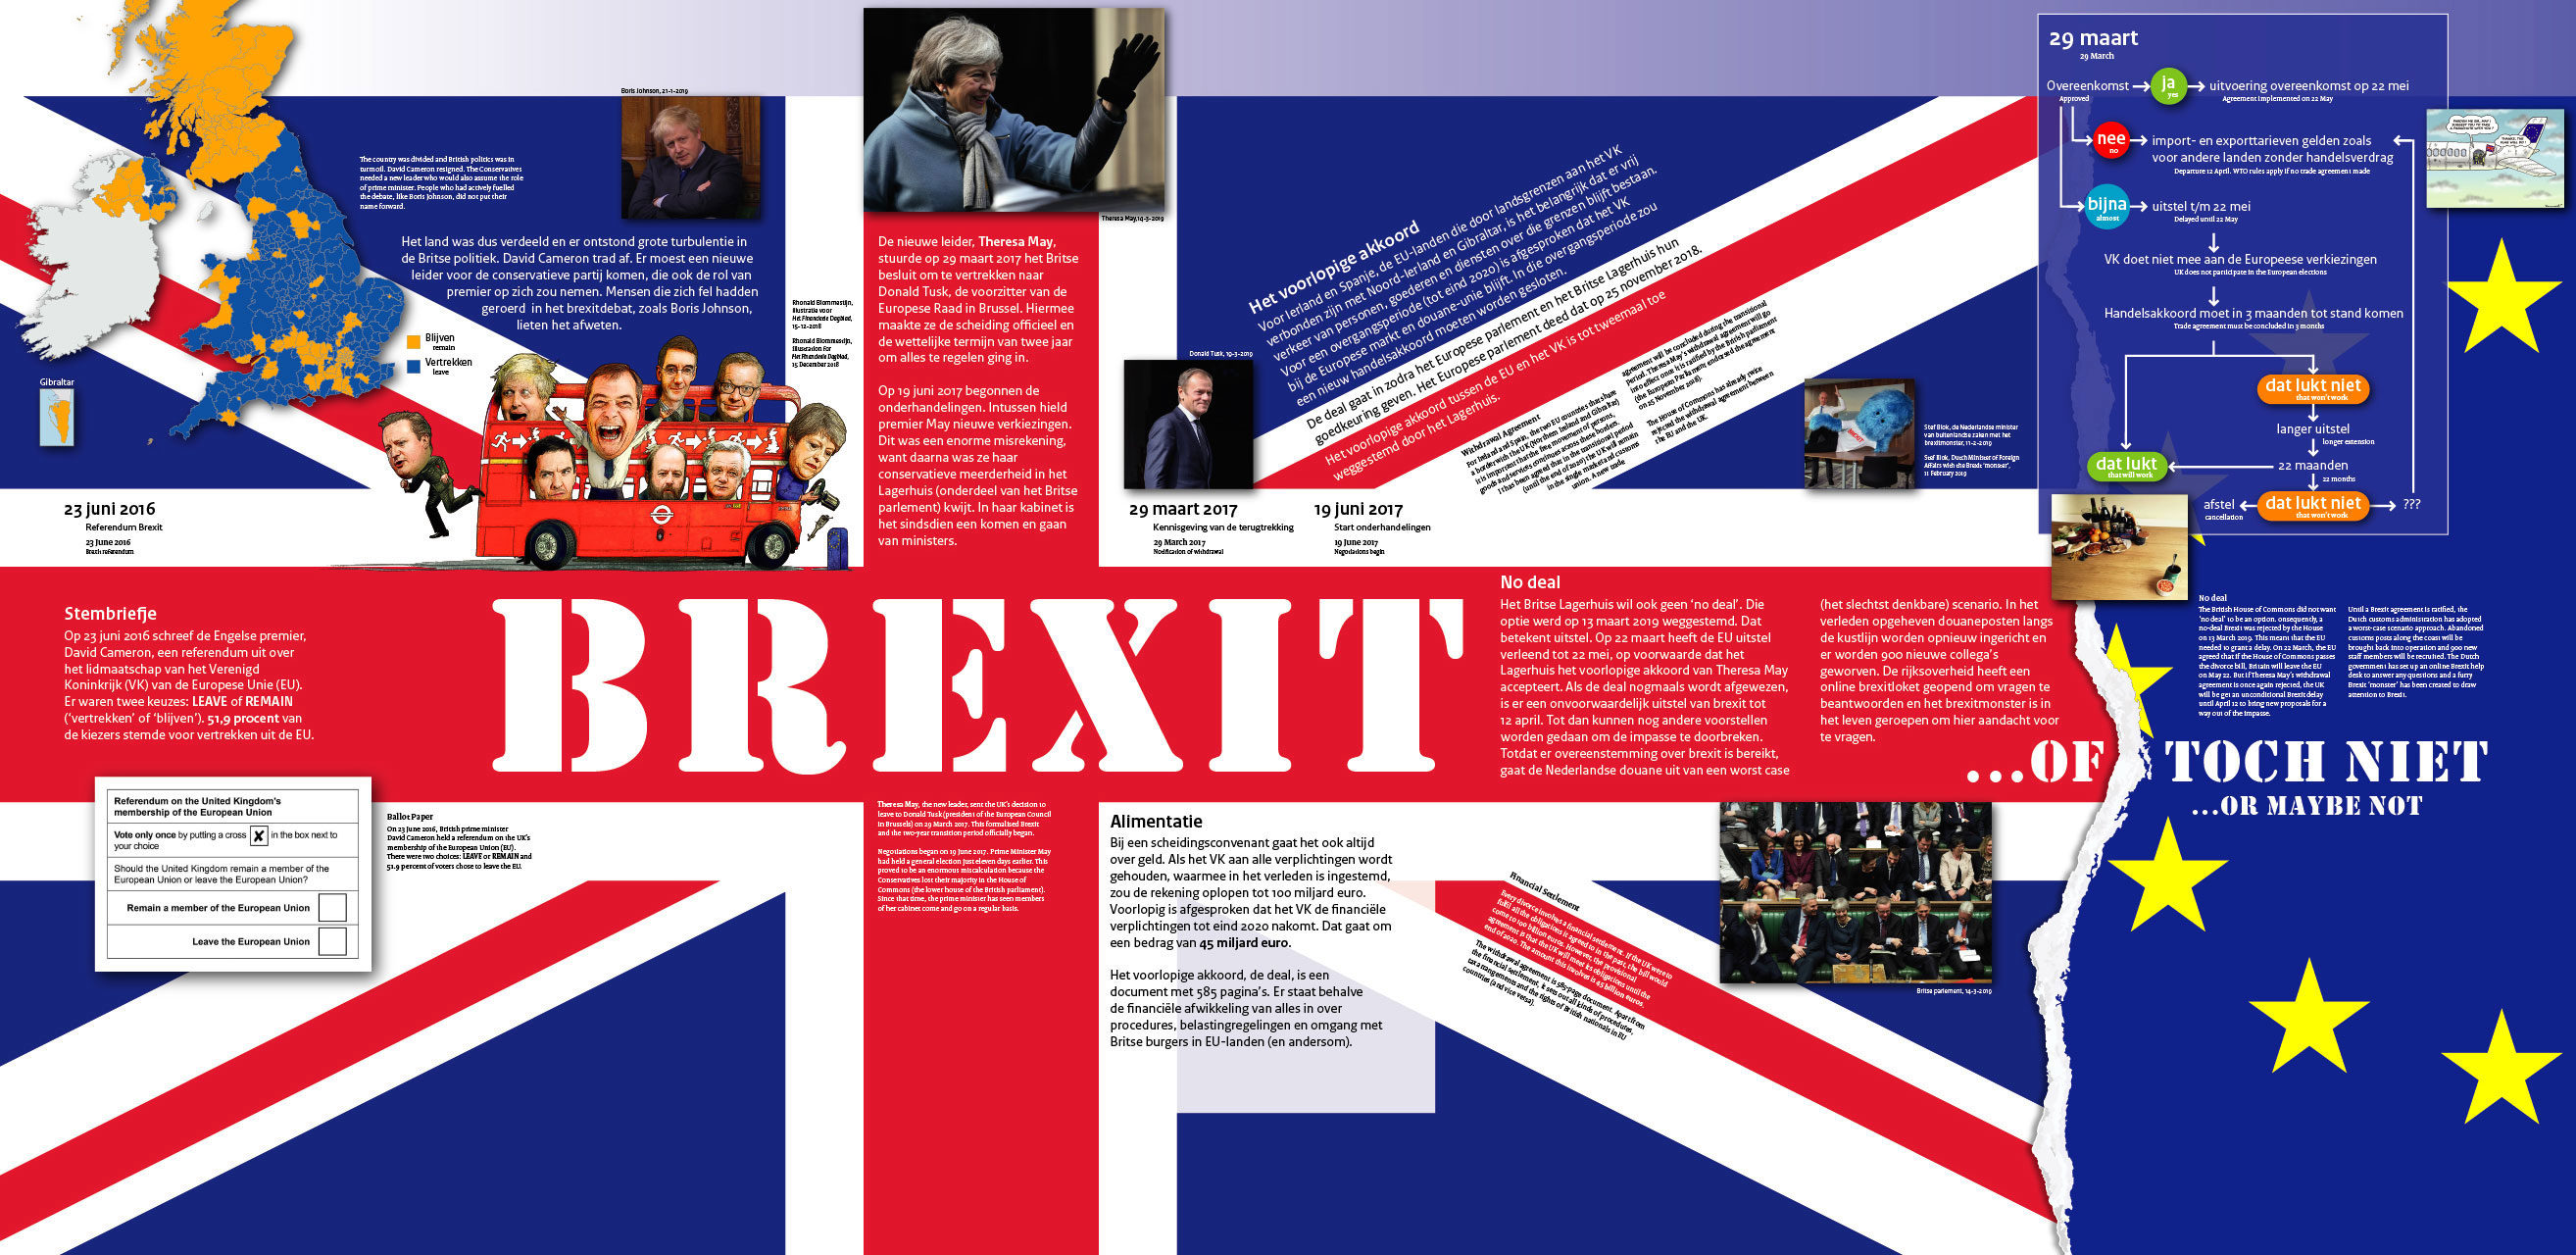 Brexit … of toch niet